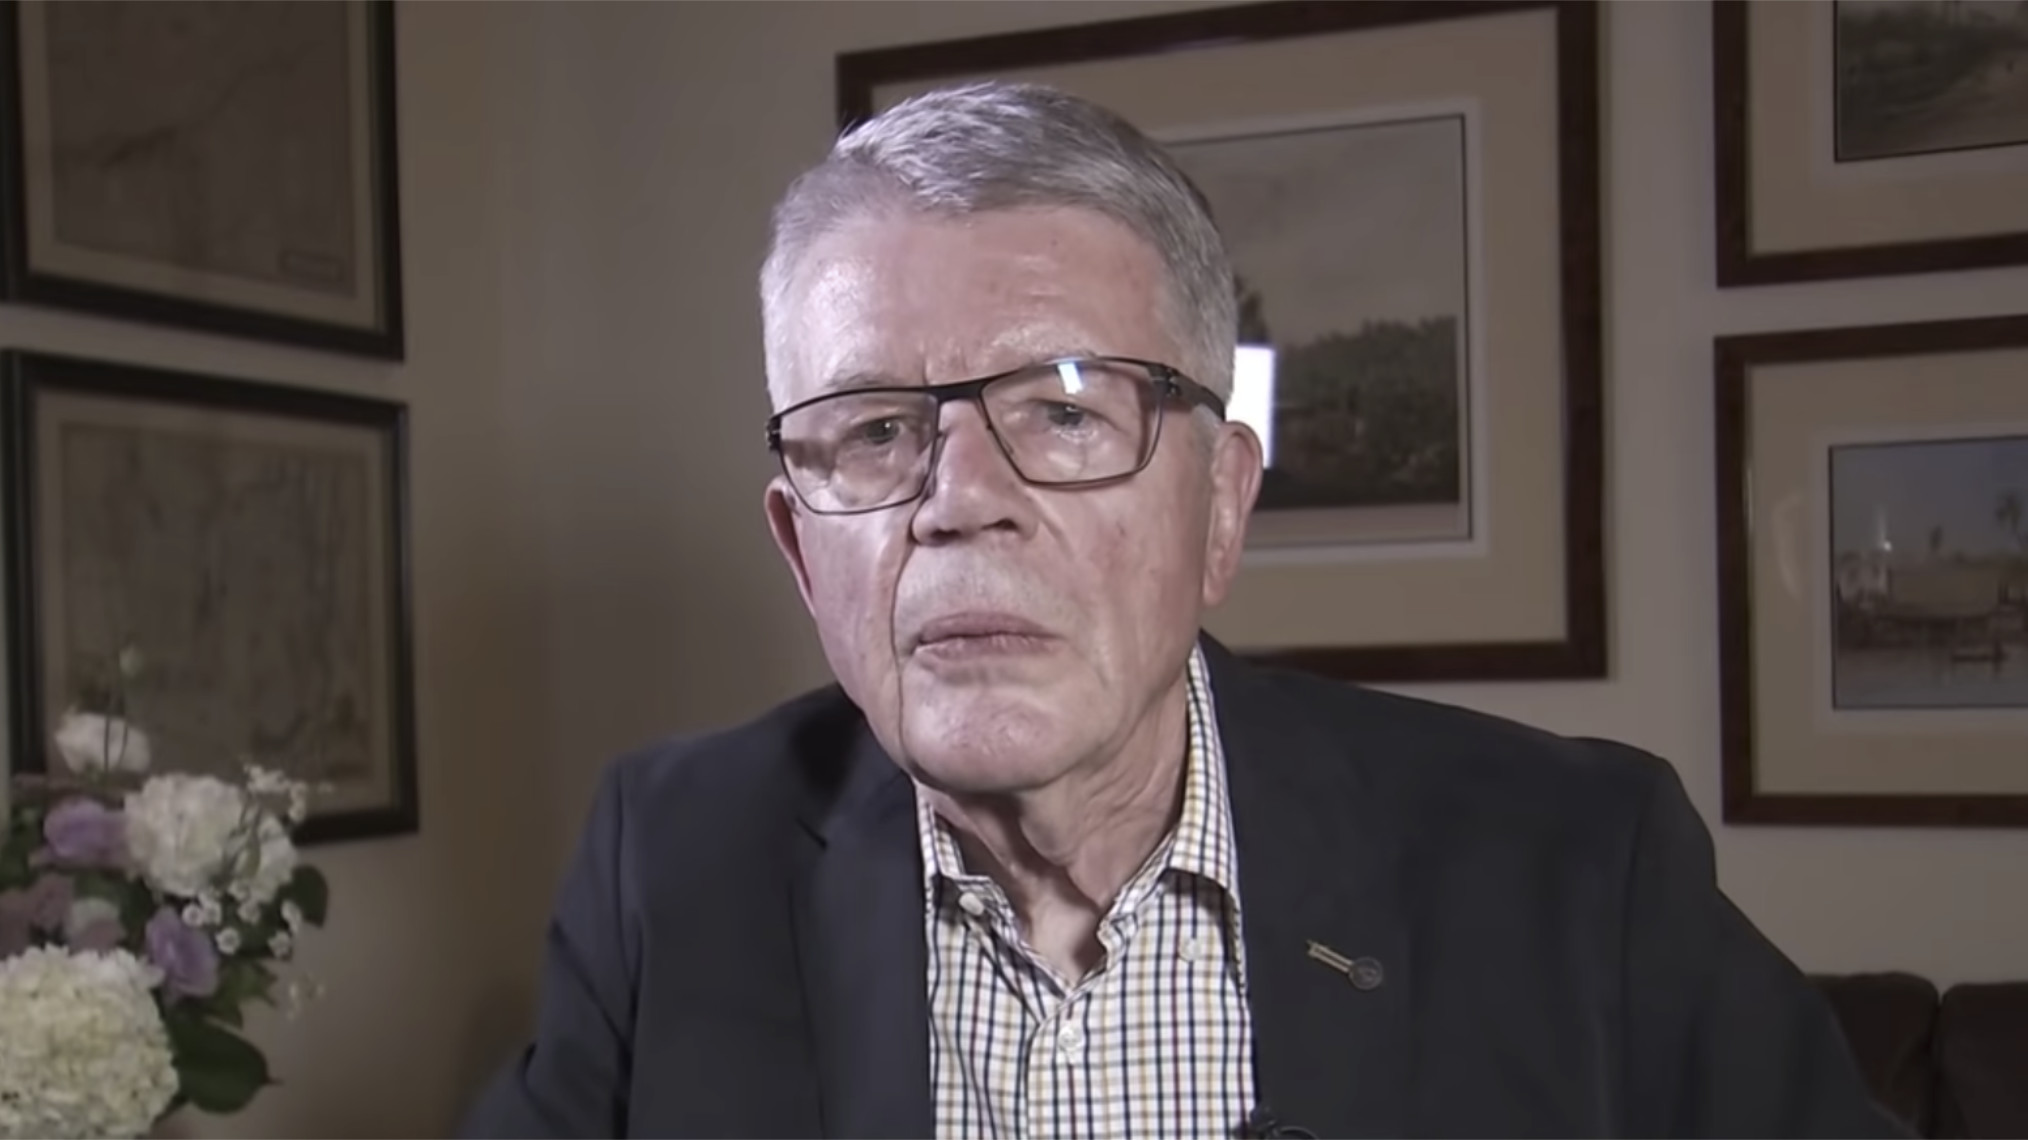 Herman Knippenberg